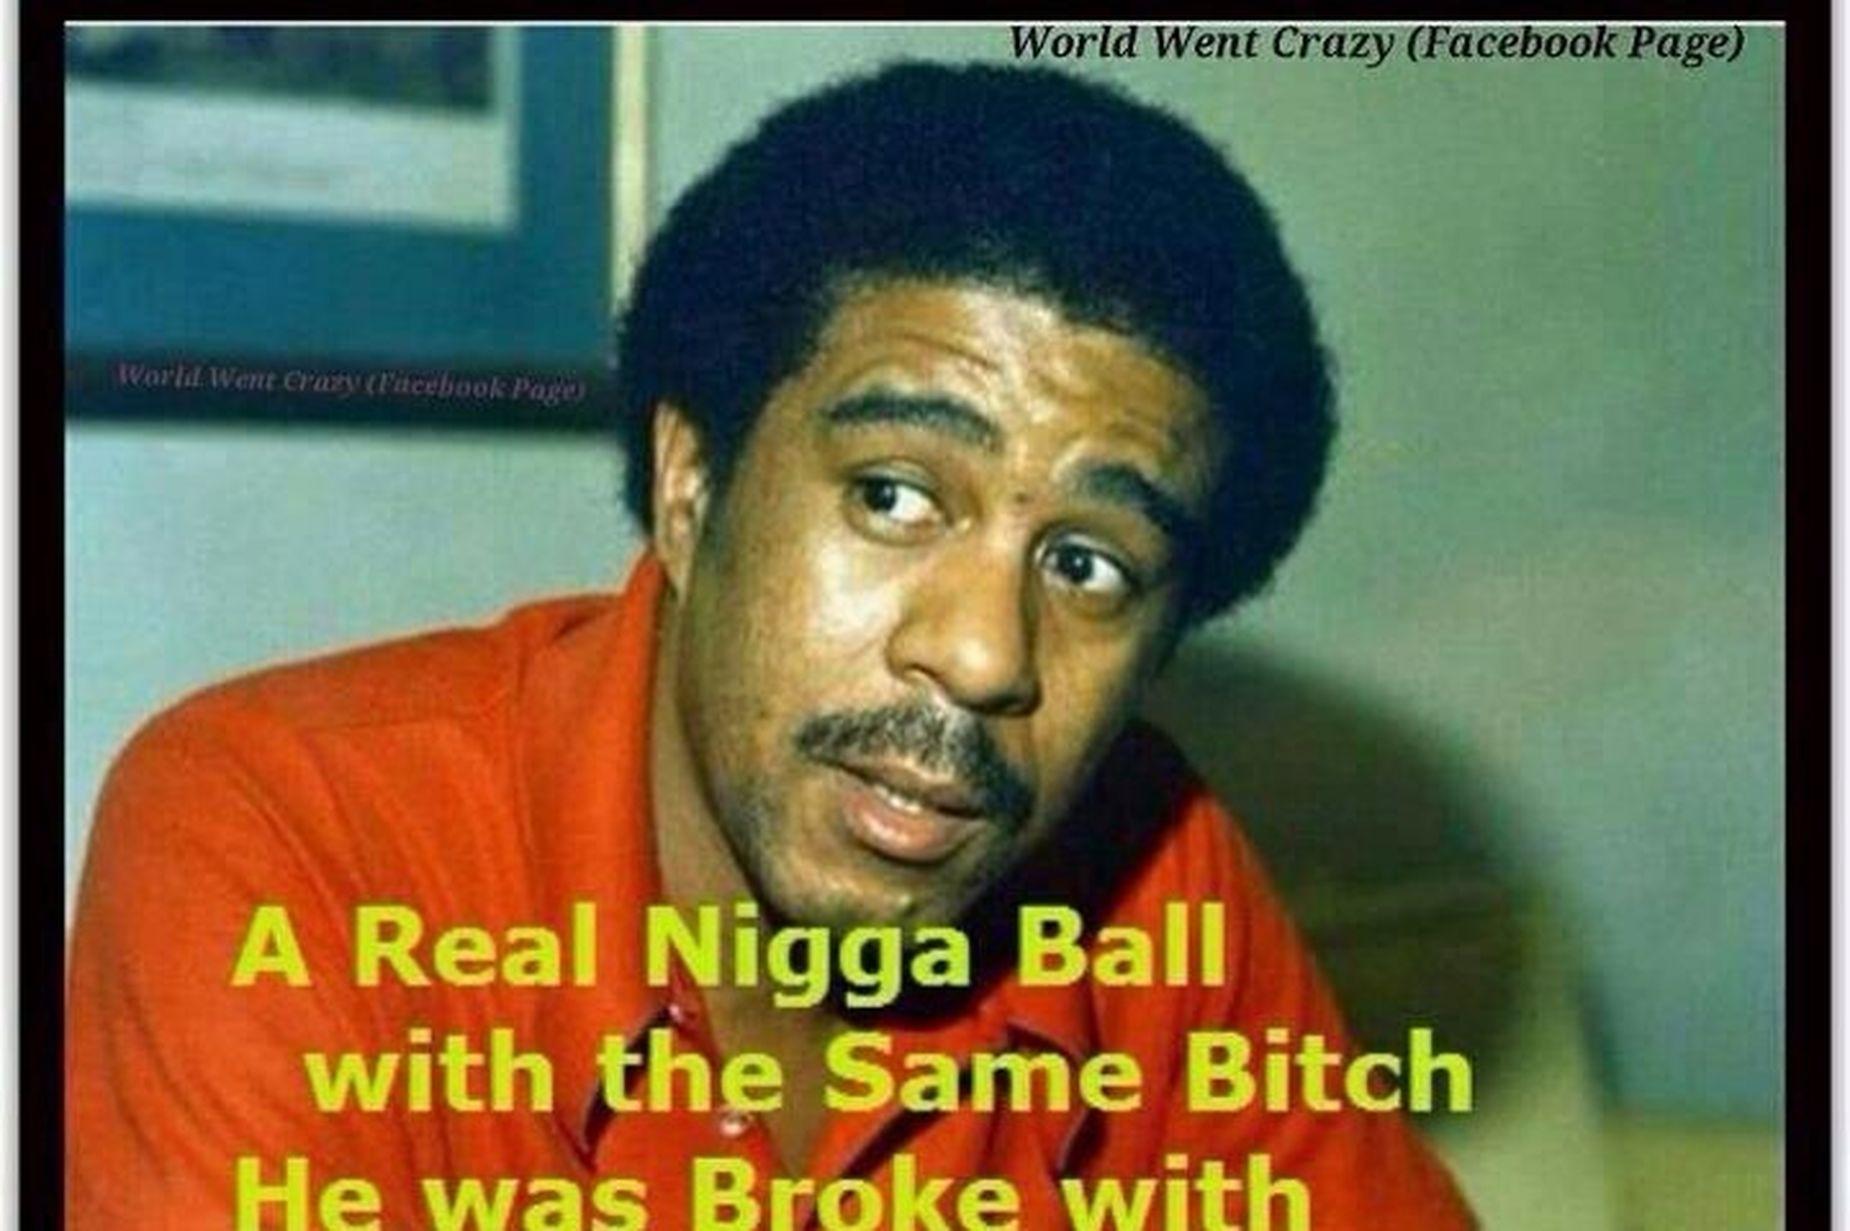 Real.